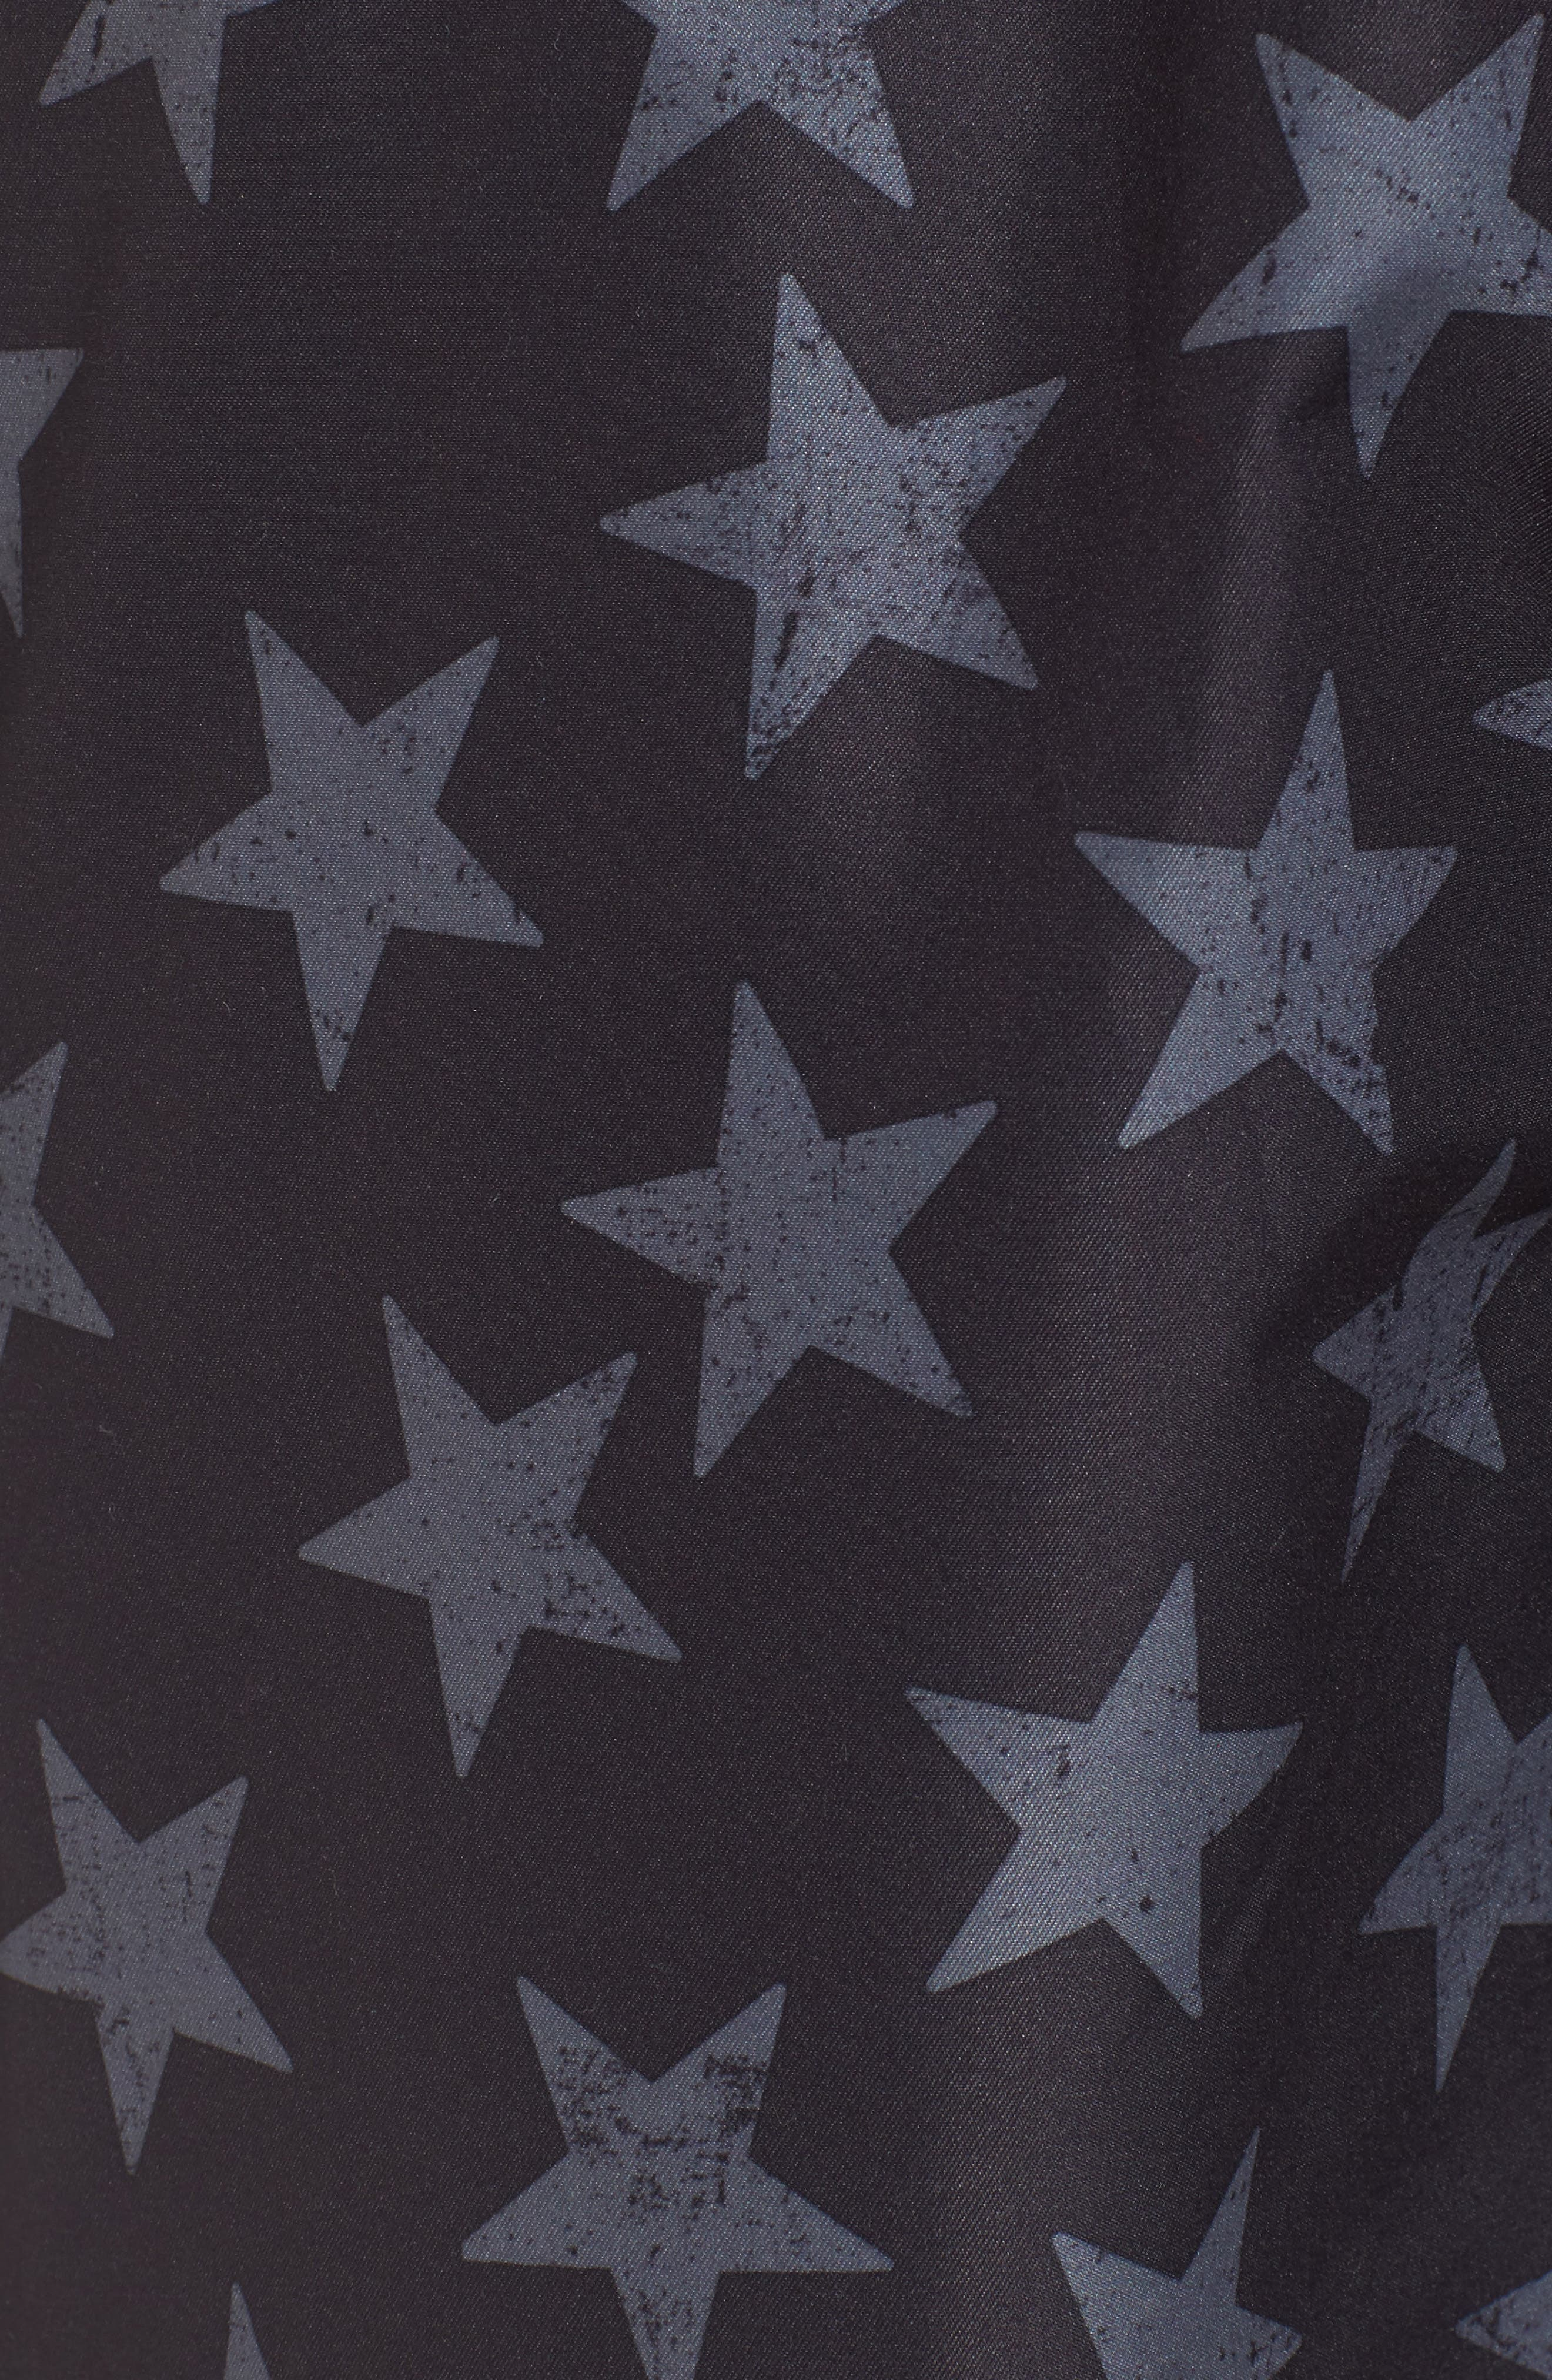 San O Stars Swim Trunks,                             Alternate thumbnail 5, color,                             Black/ Steel Grey